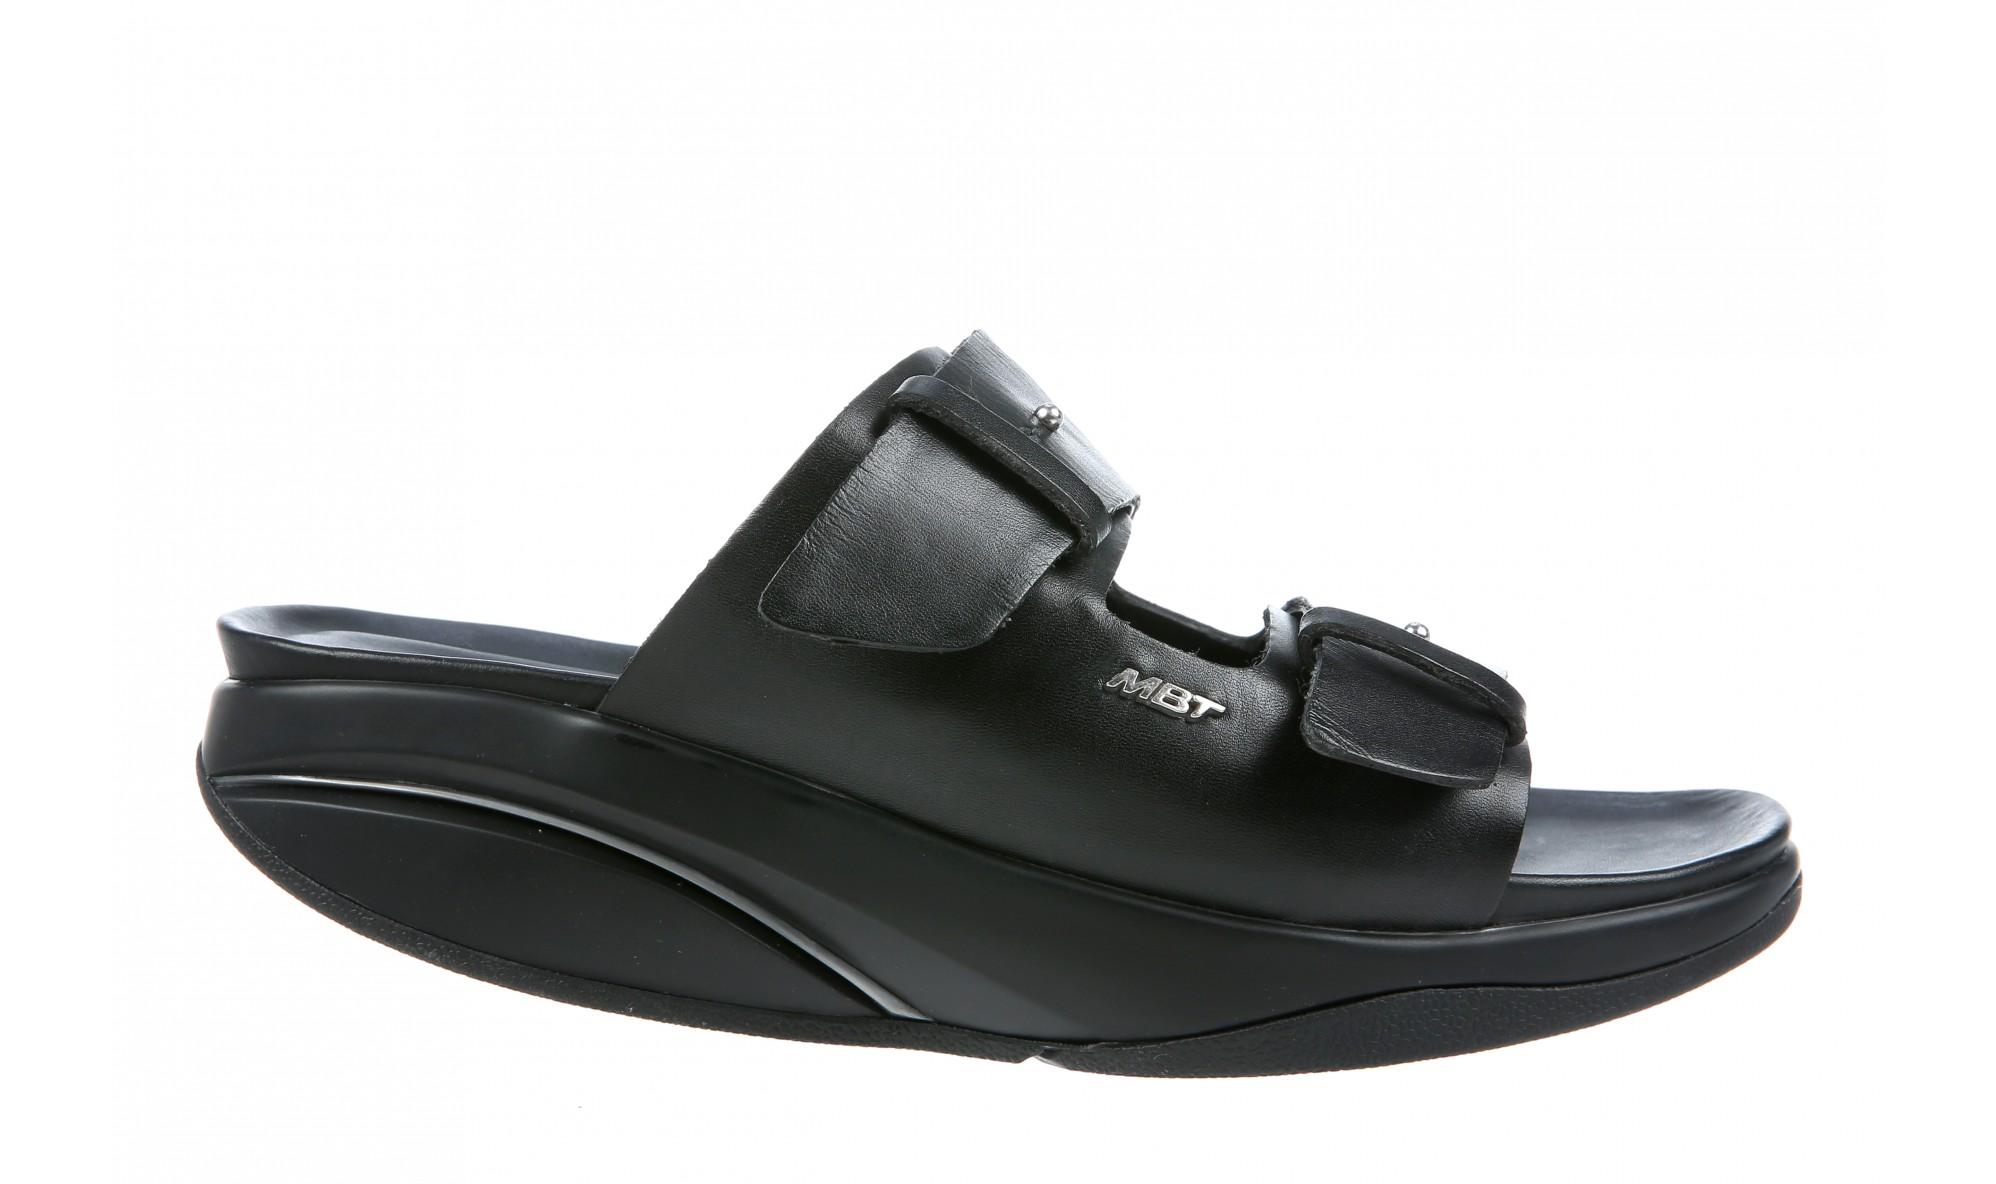 MBT Kimana Women's Sandal Black